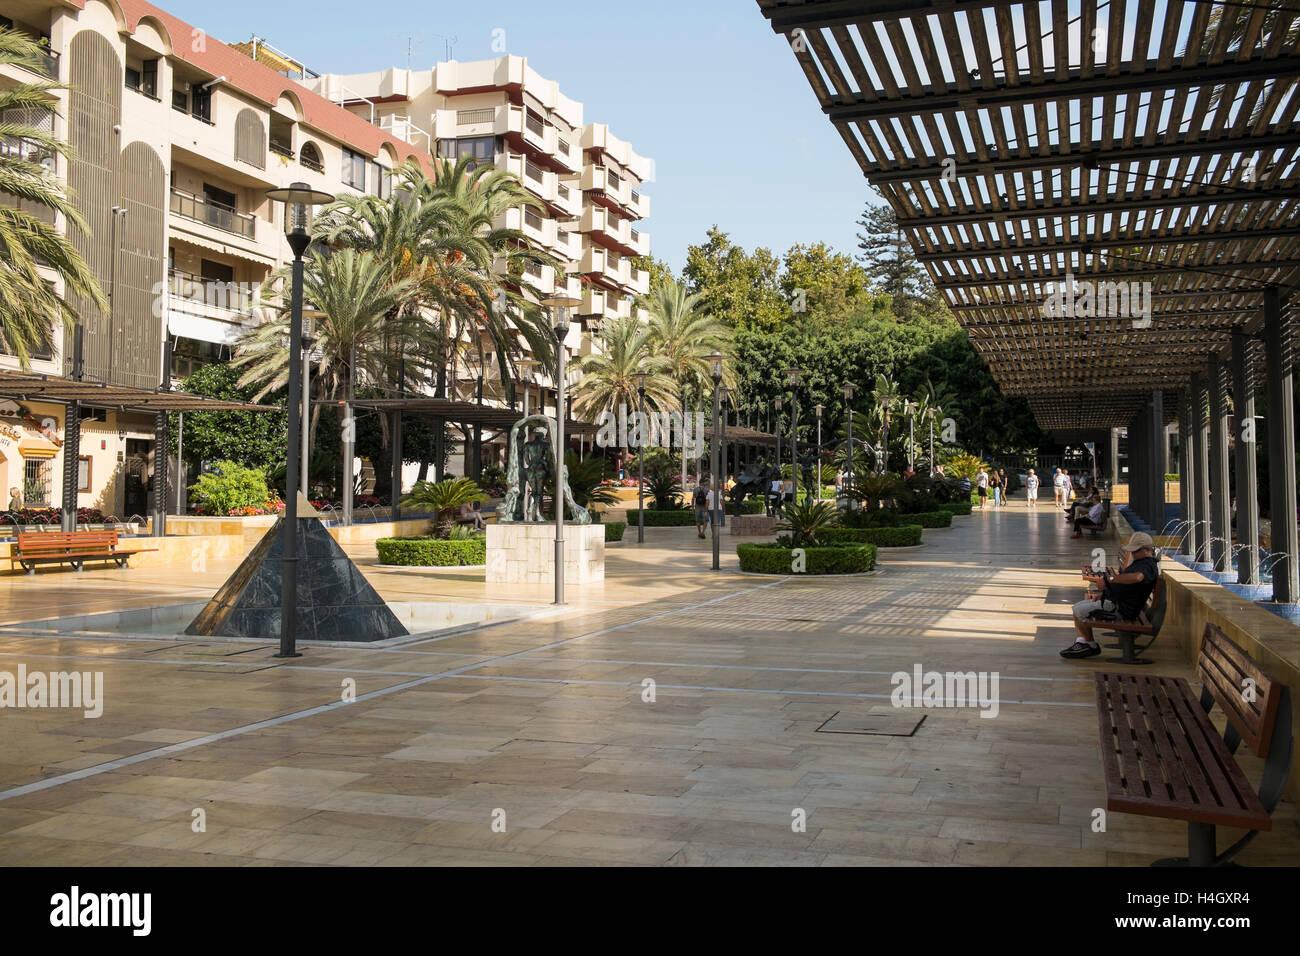 Avenida del Mar, Marbella, Costa del Sol, Málaga province, Andalusia, Spain - Stock Image